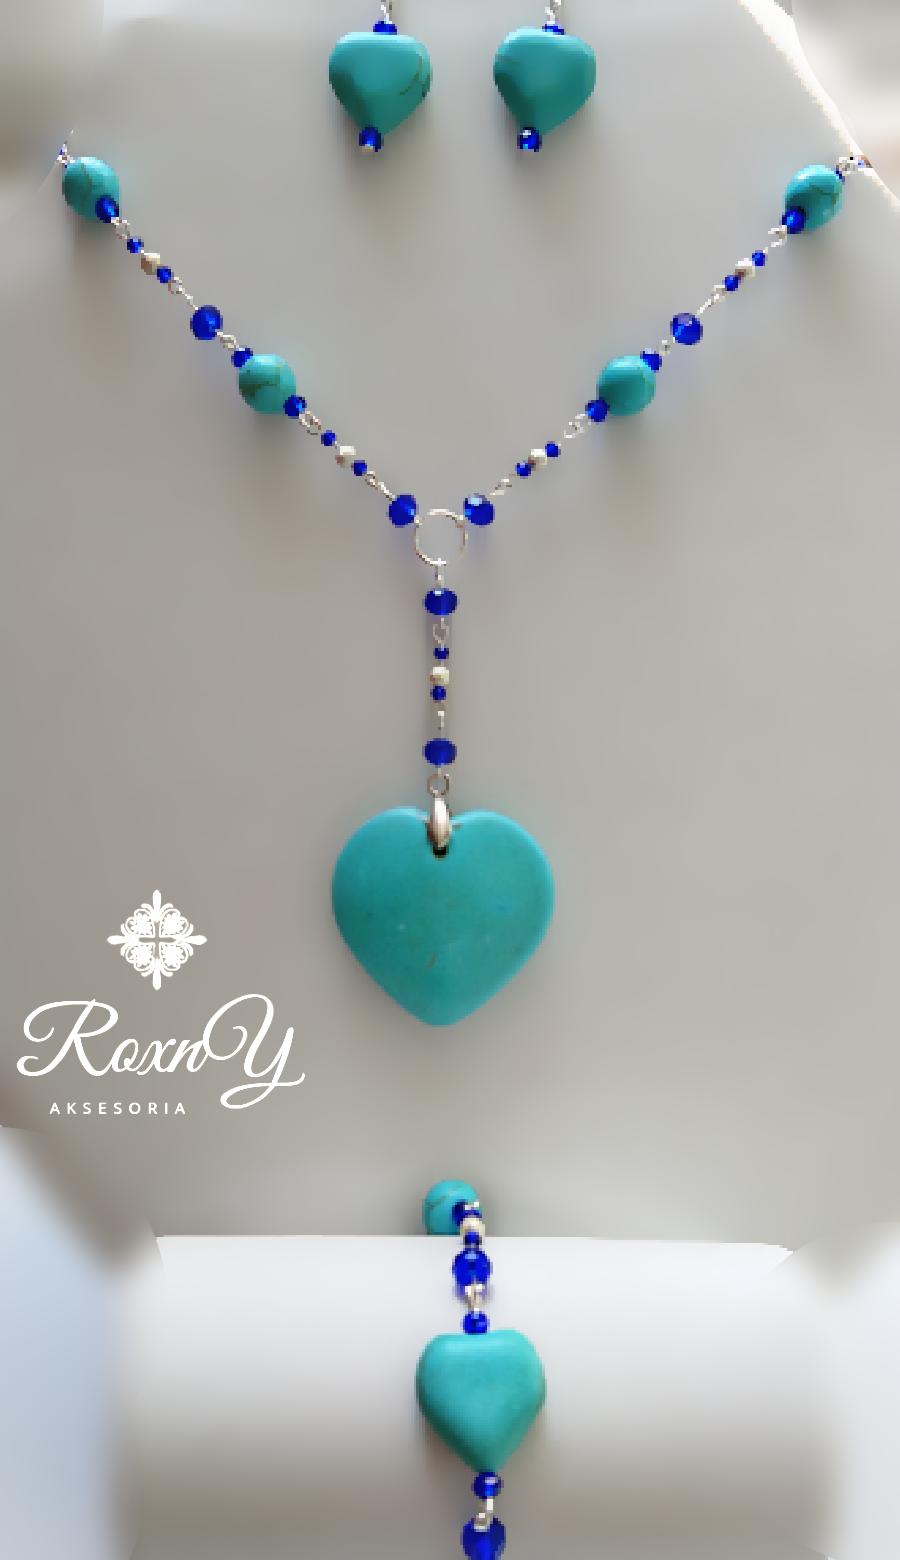 Collar Turquesa Corazón Para Mujer Pulsera Aretes Aretes Piedra Turquesa Collar De Colores